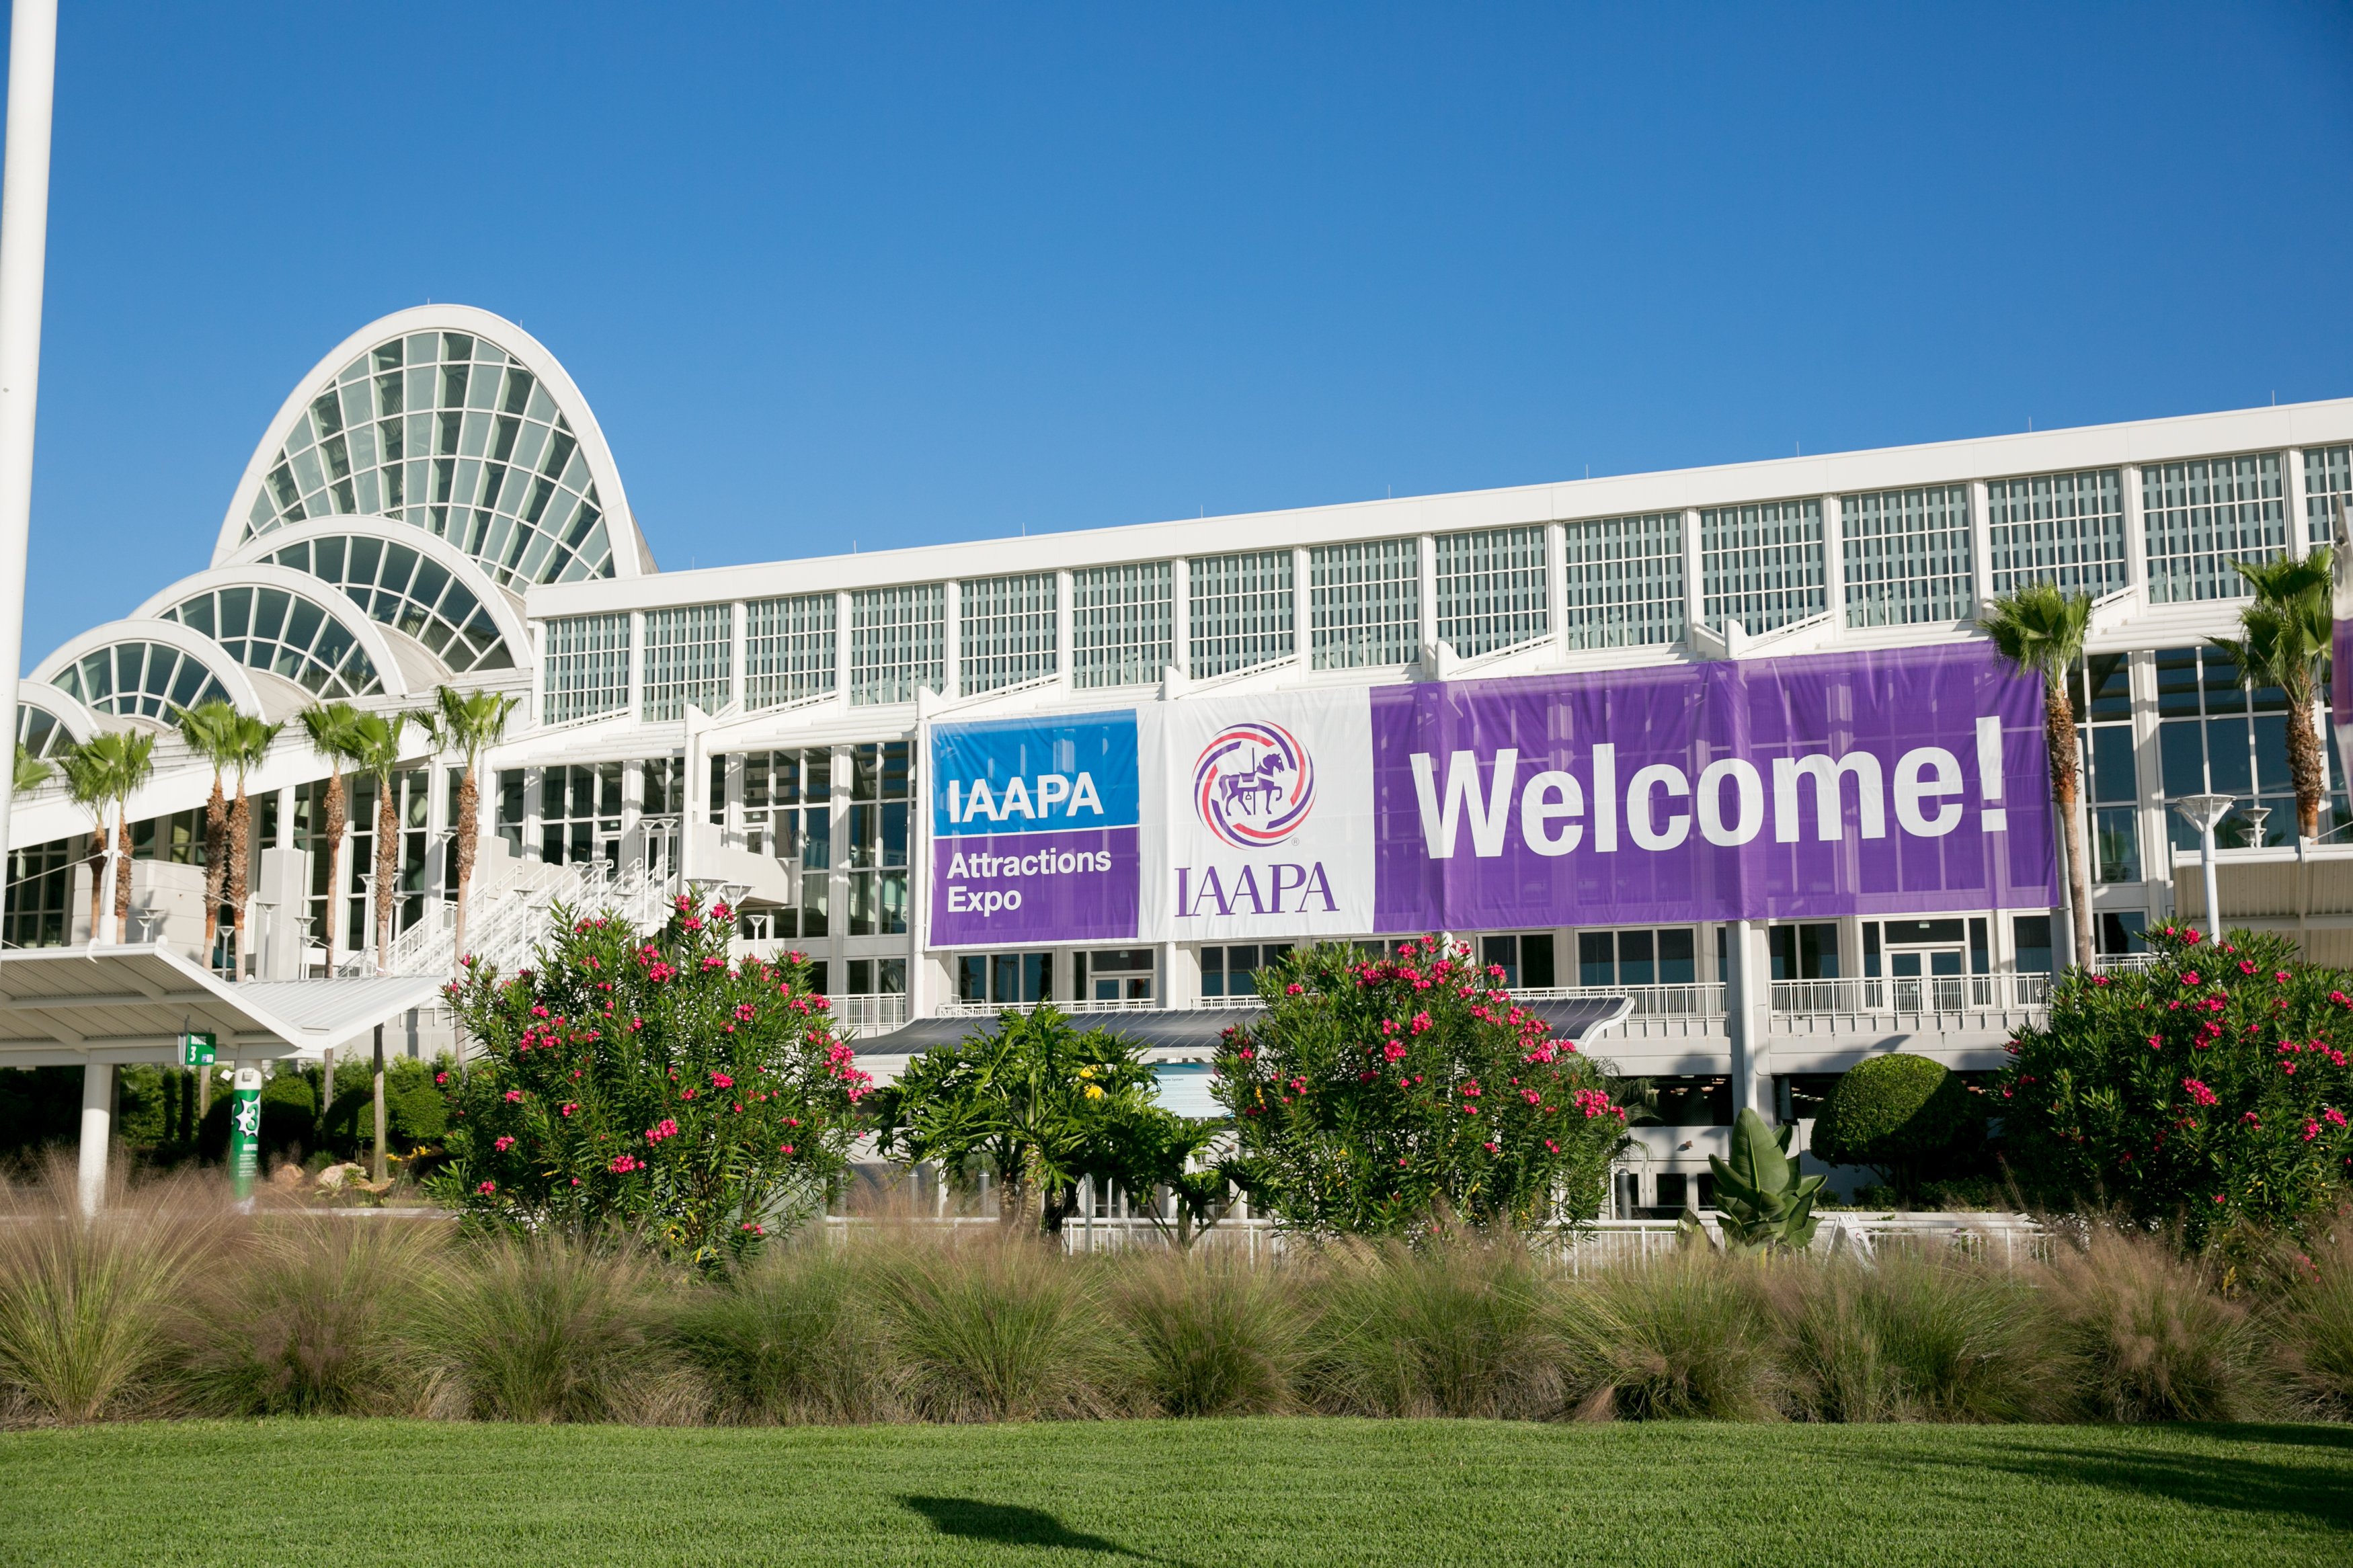 Iaapa attractions expo - 2013, орландо (флорида), сша